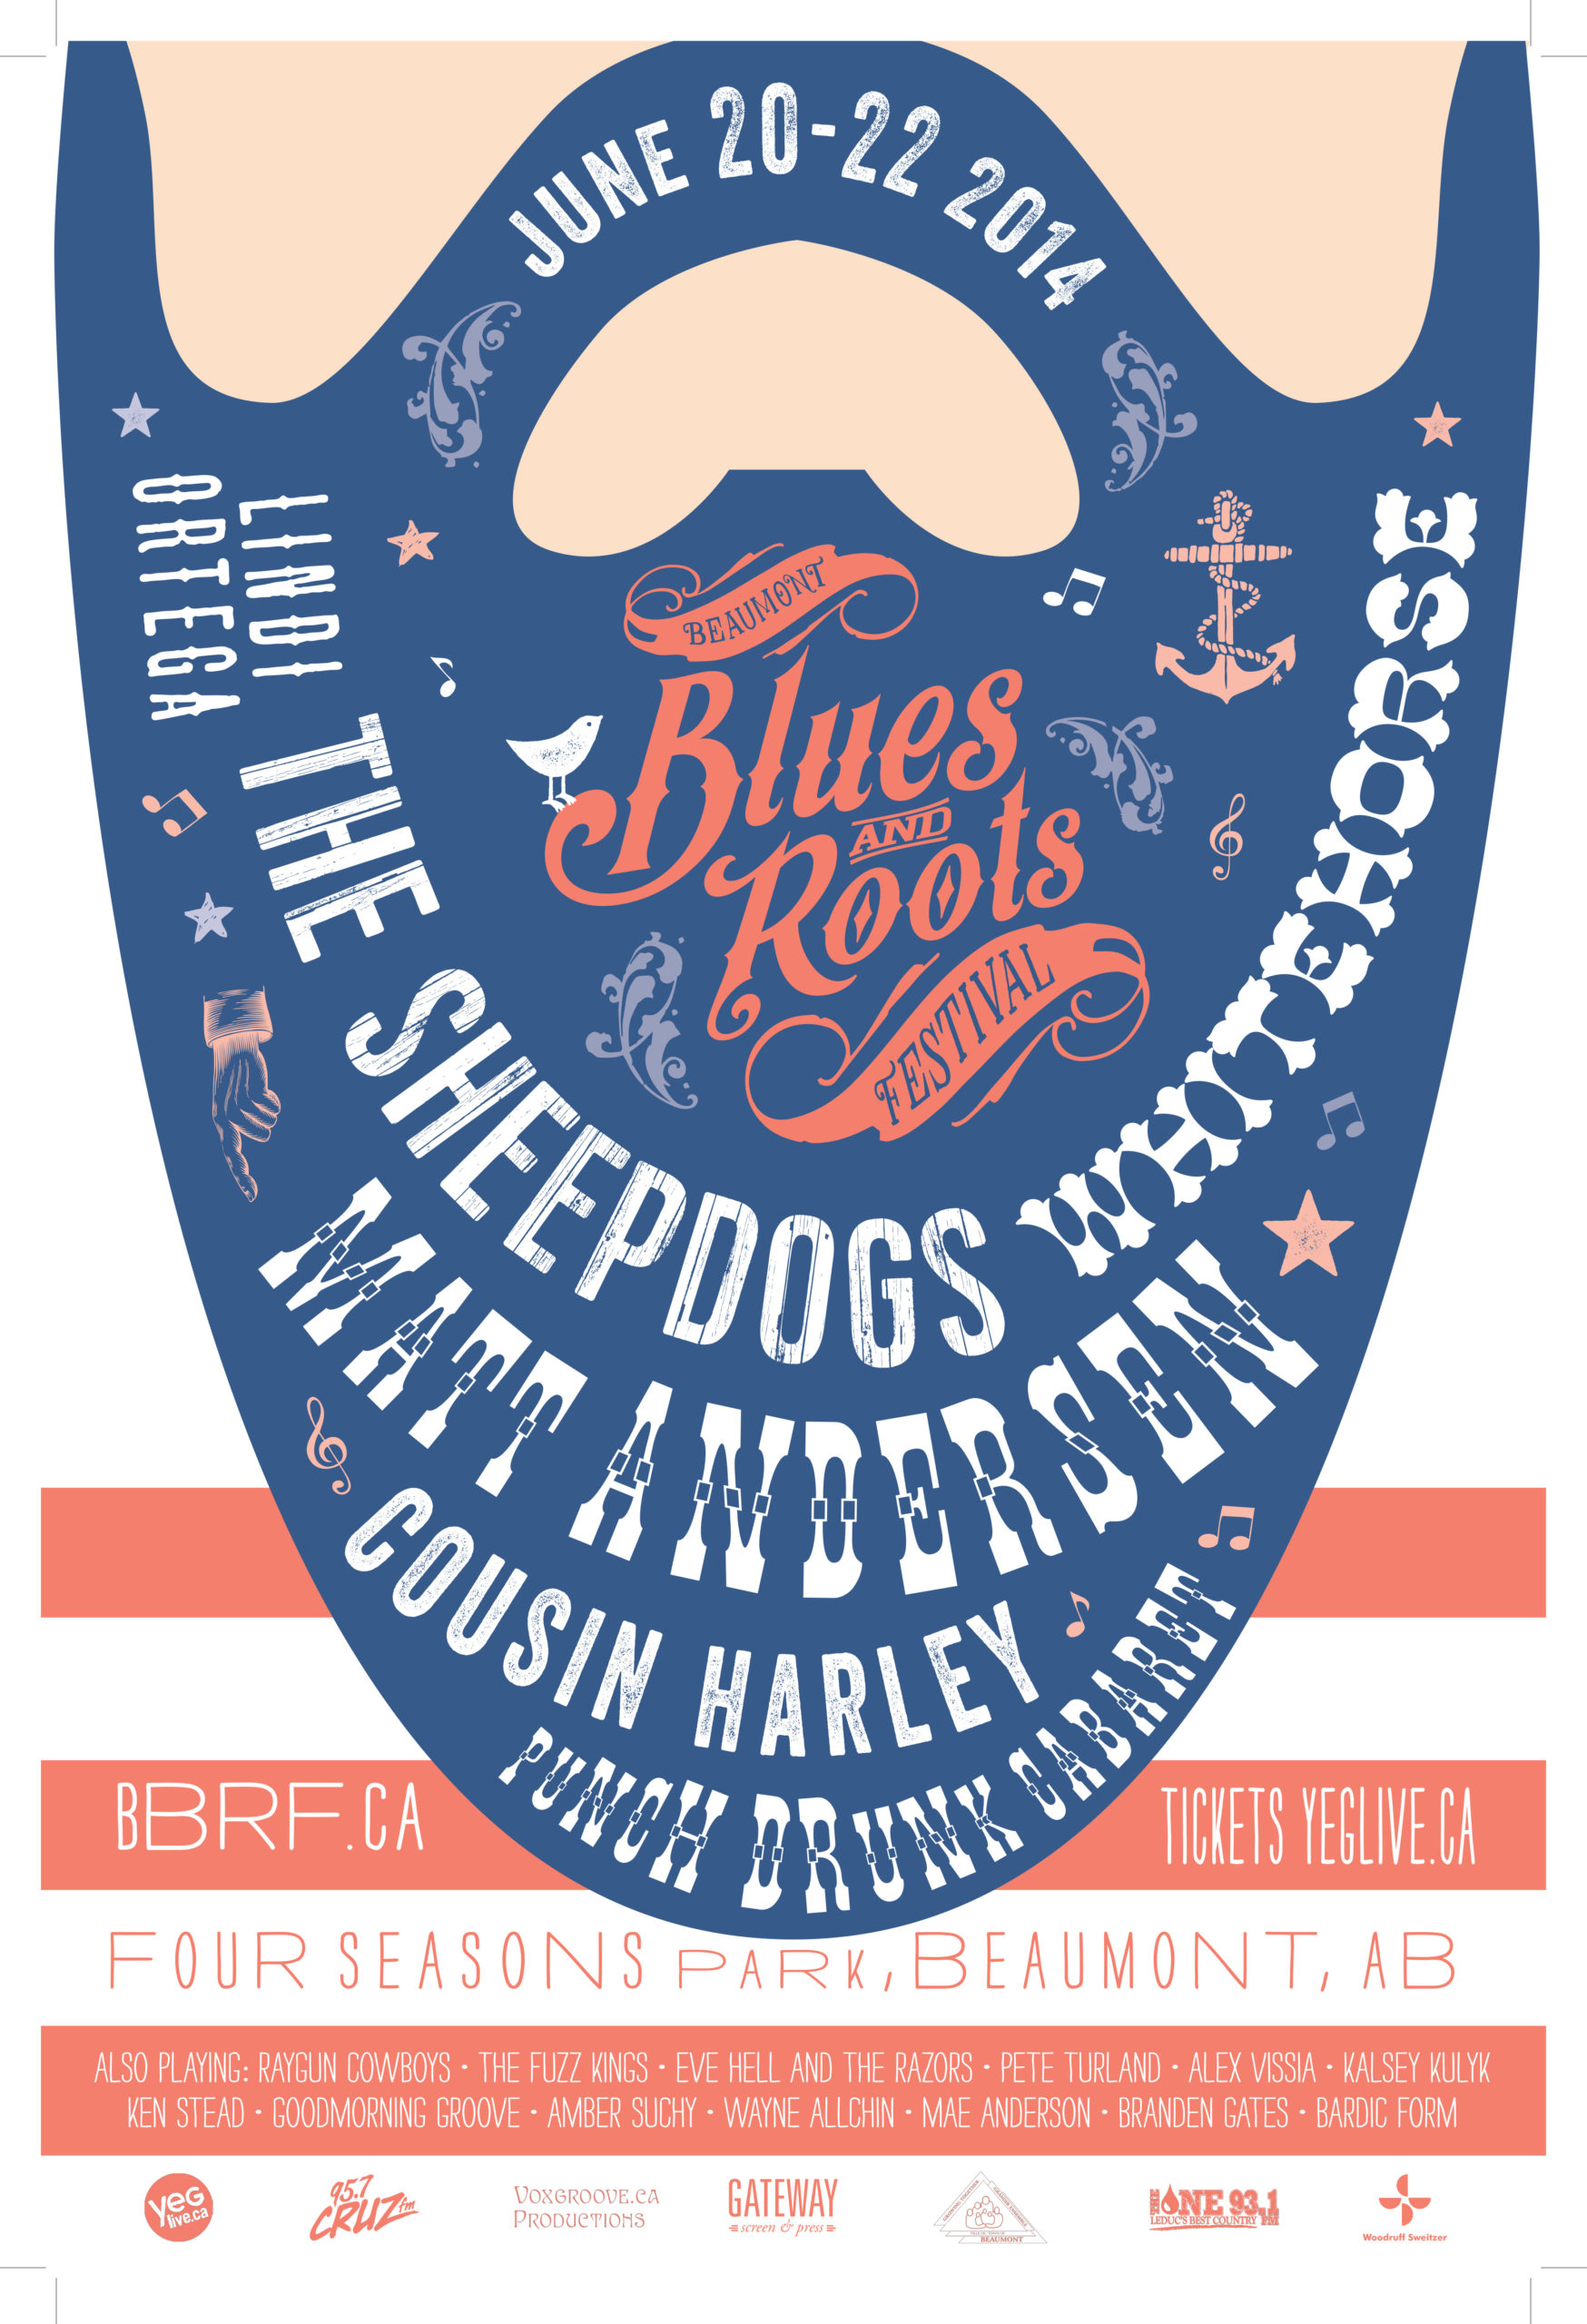 Beaumont Blues & Roots Festival 2014 Beard